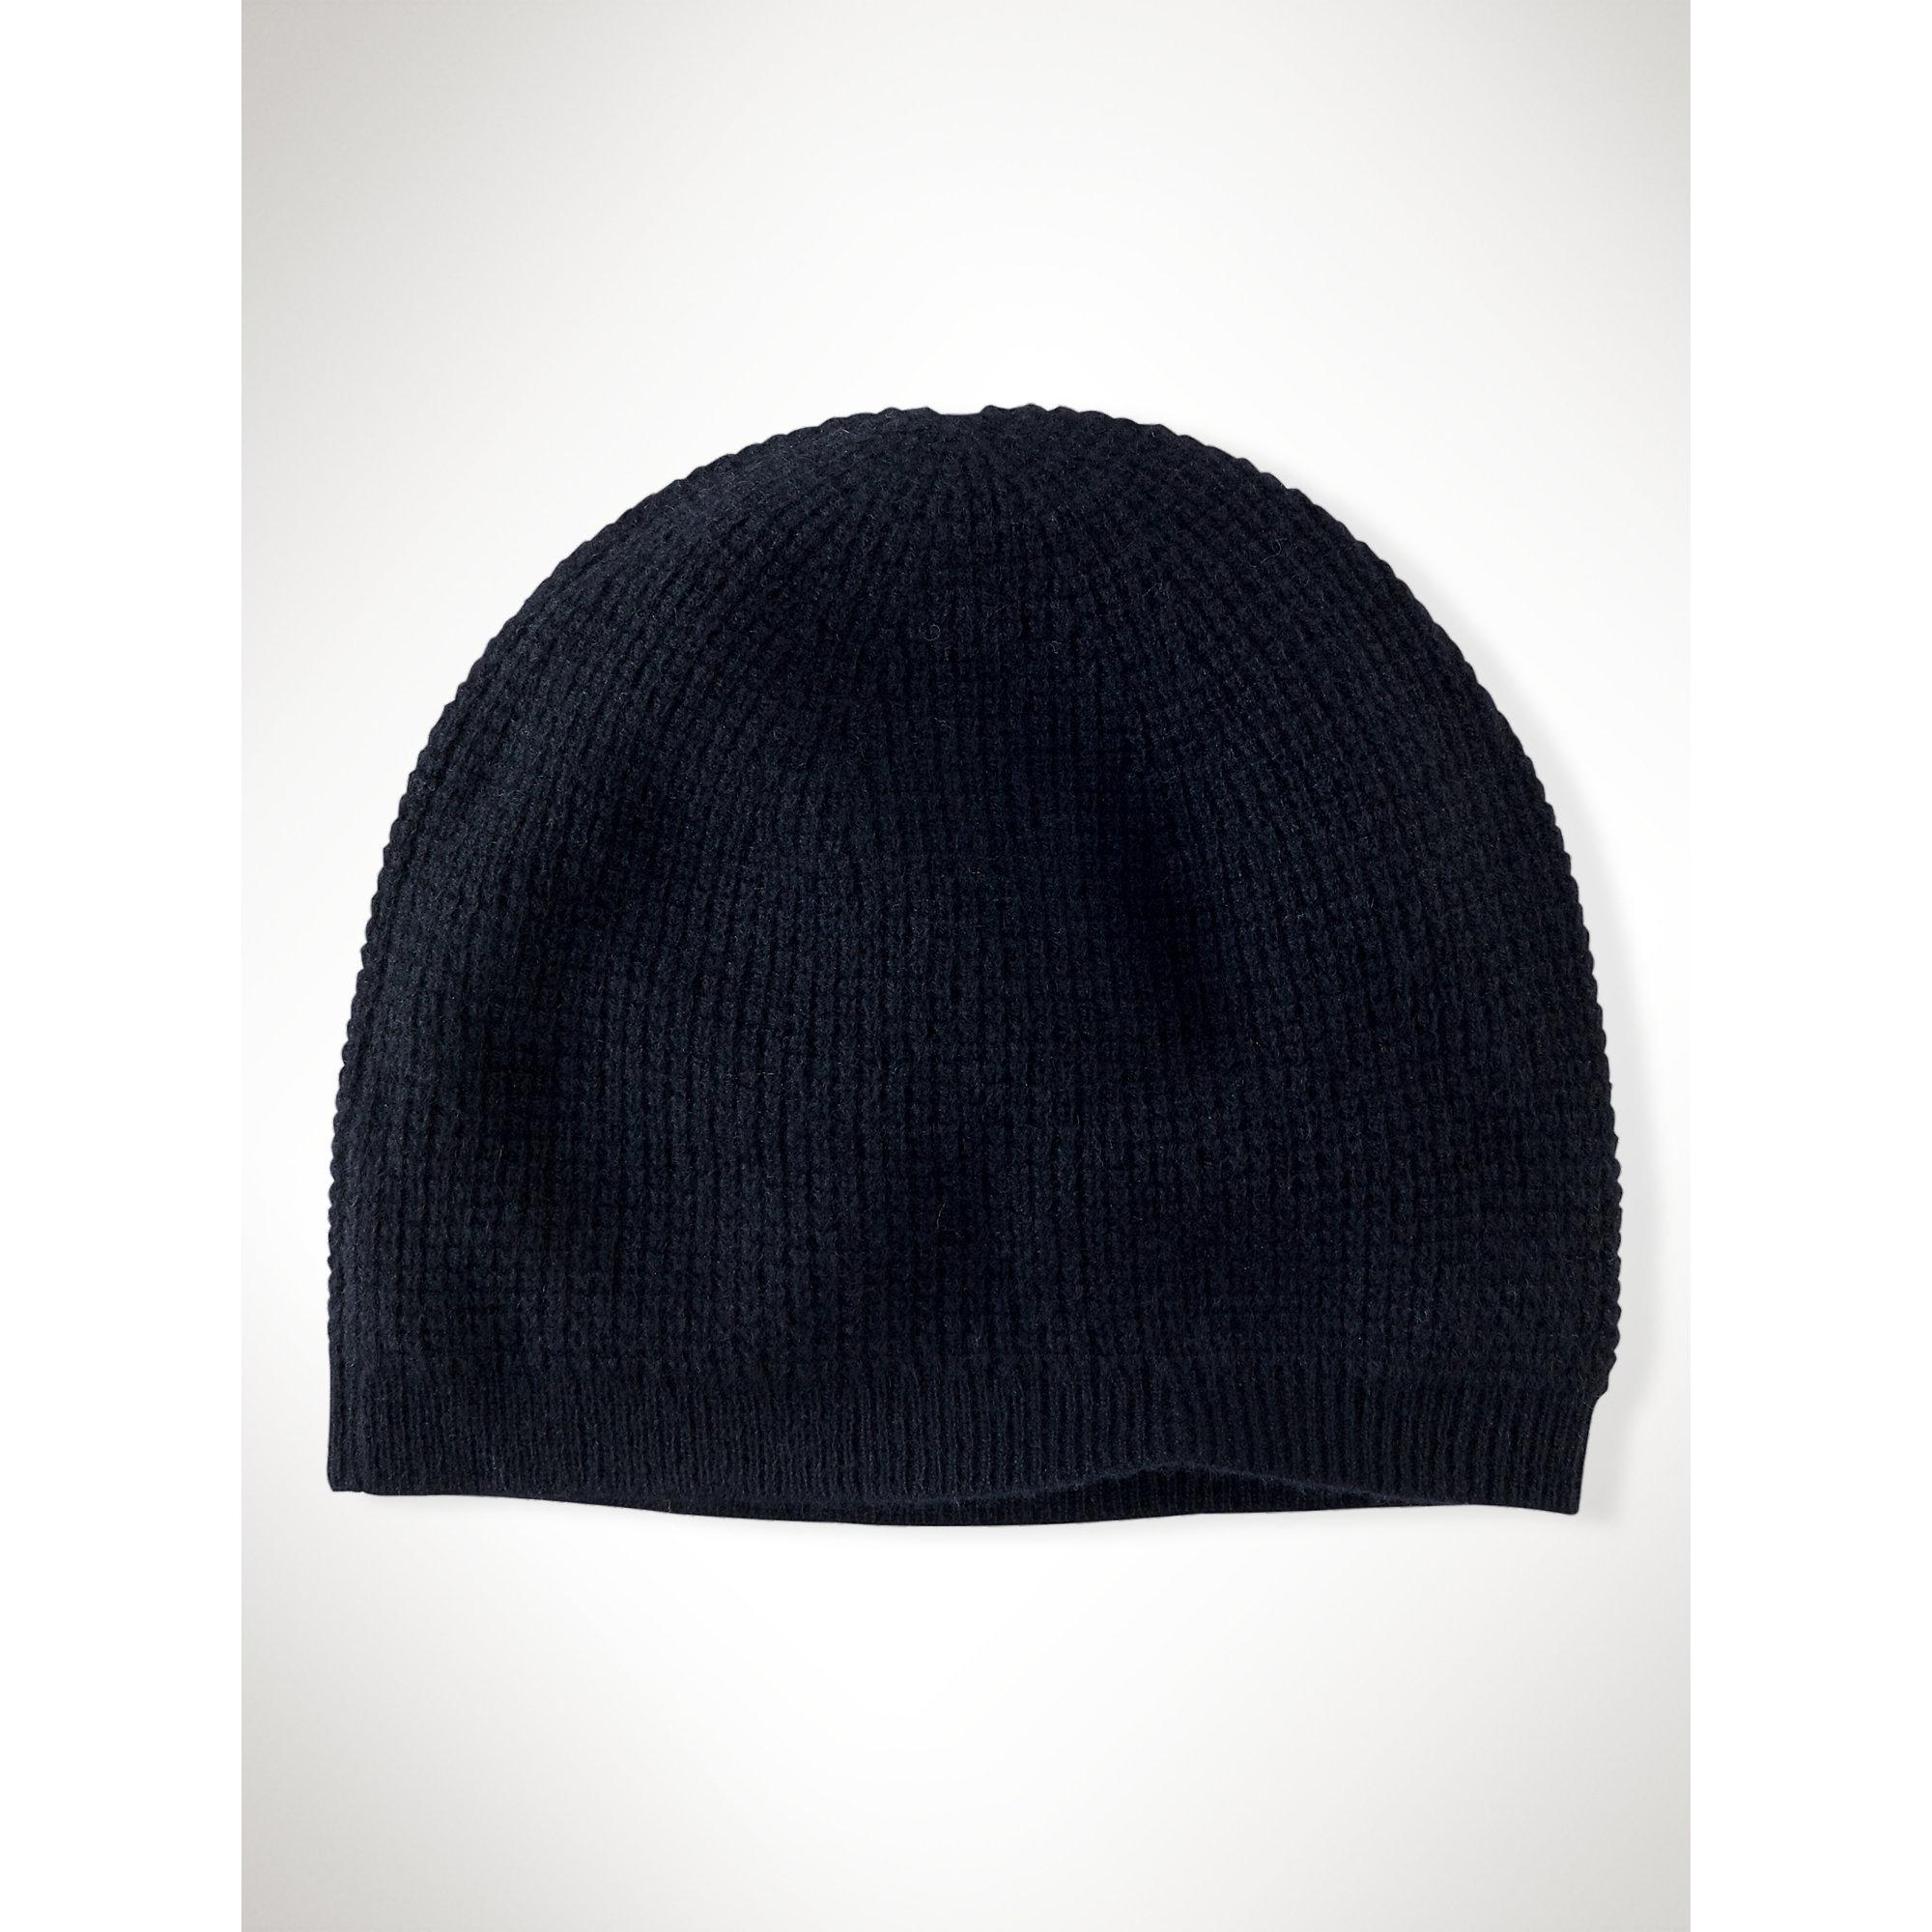 Knitting Pattern Cashmere Hat : Ralph lauren black label Waffle-Knit Cashmere Hat in Black Lyst